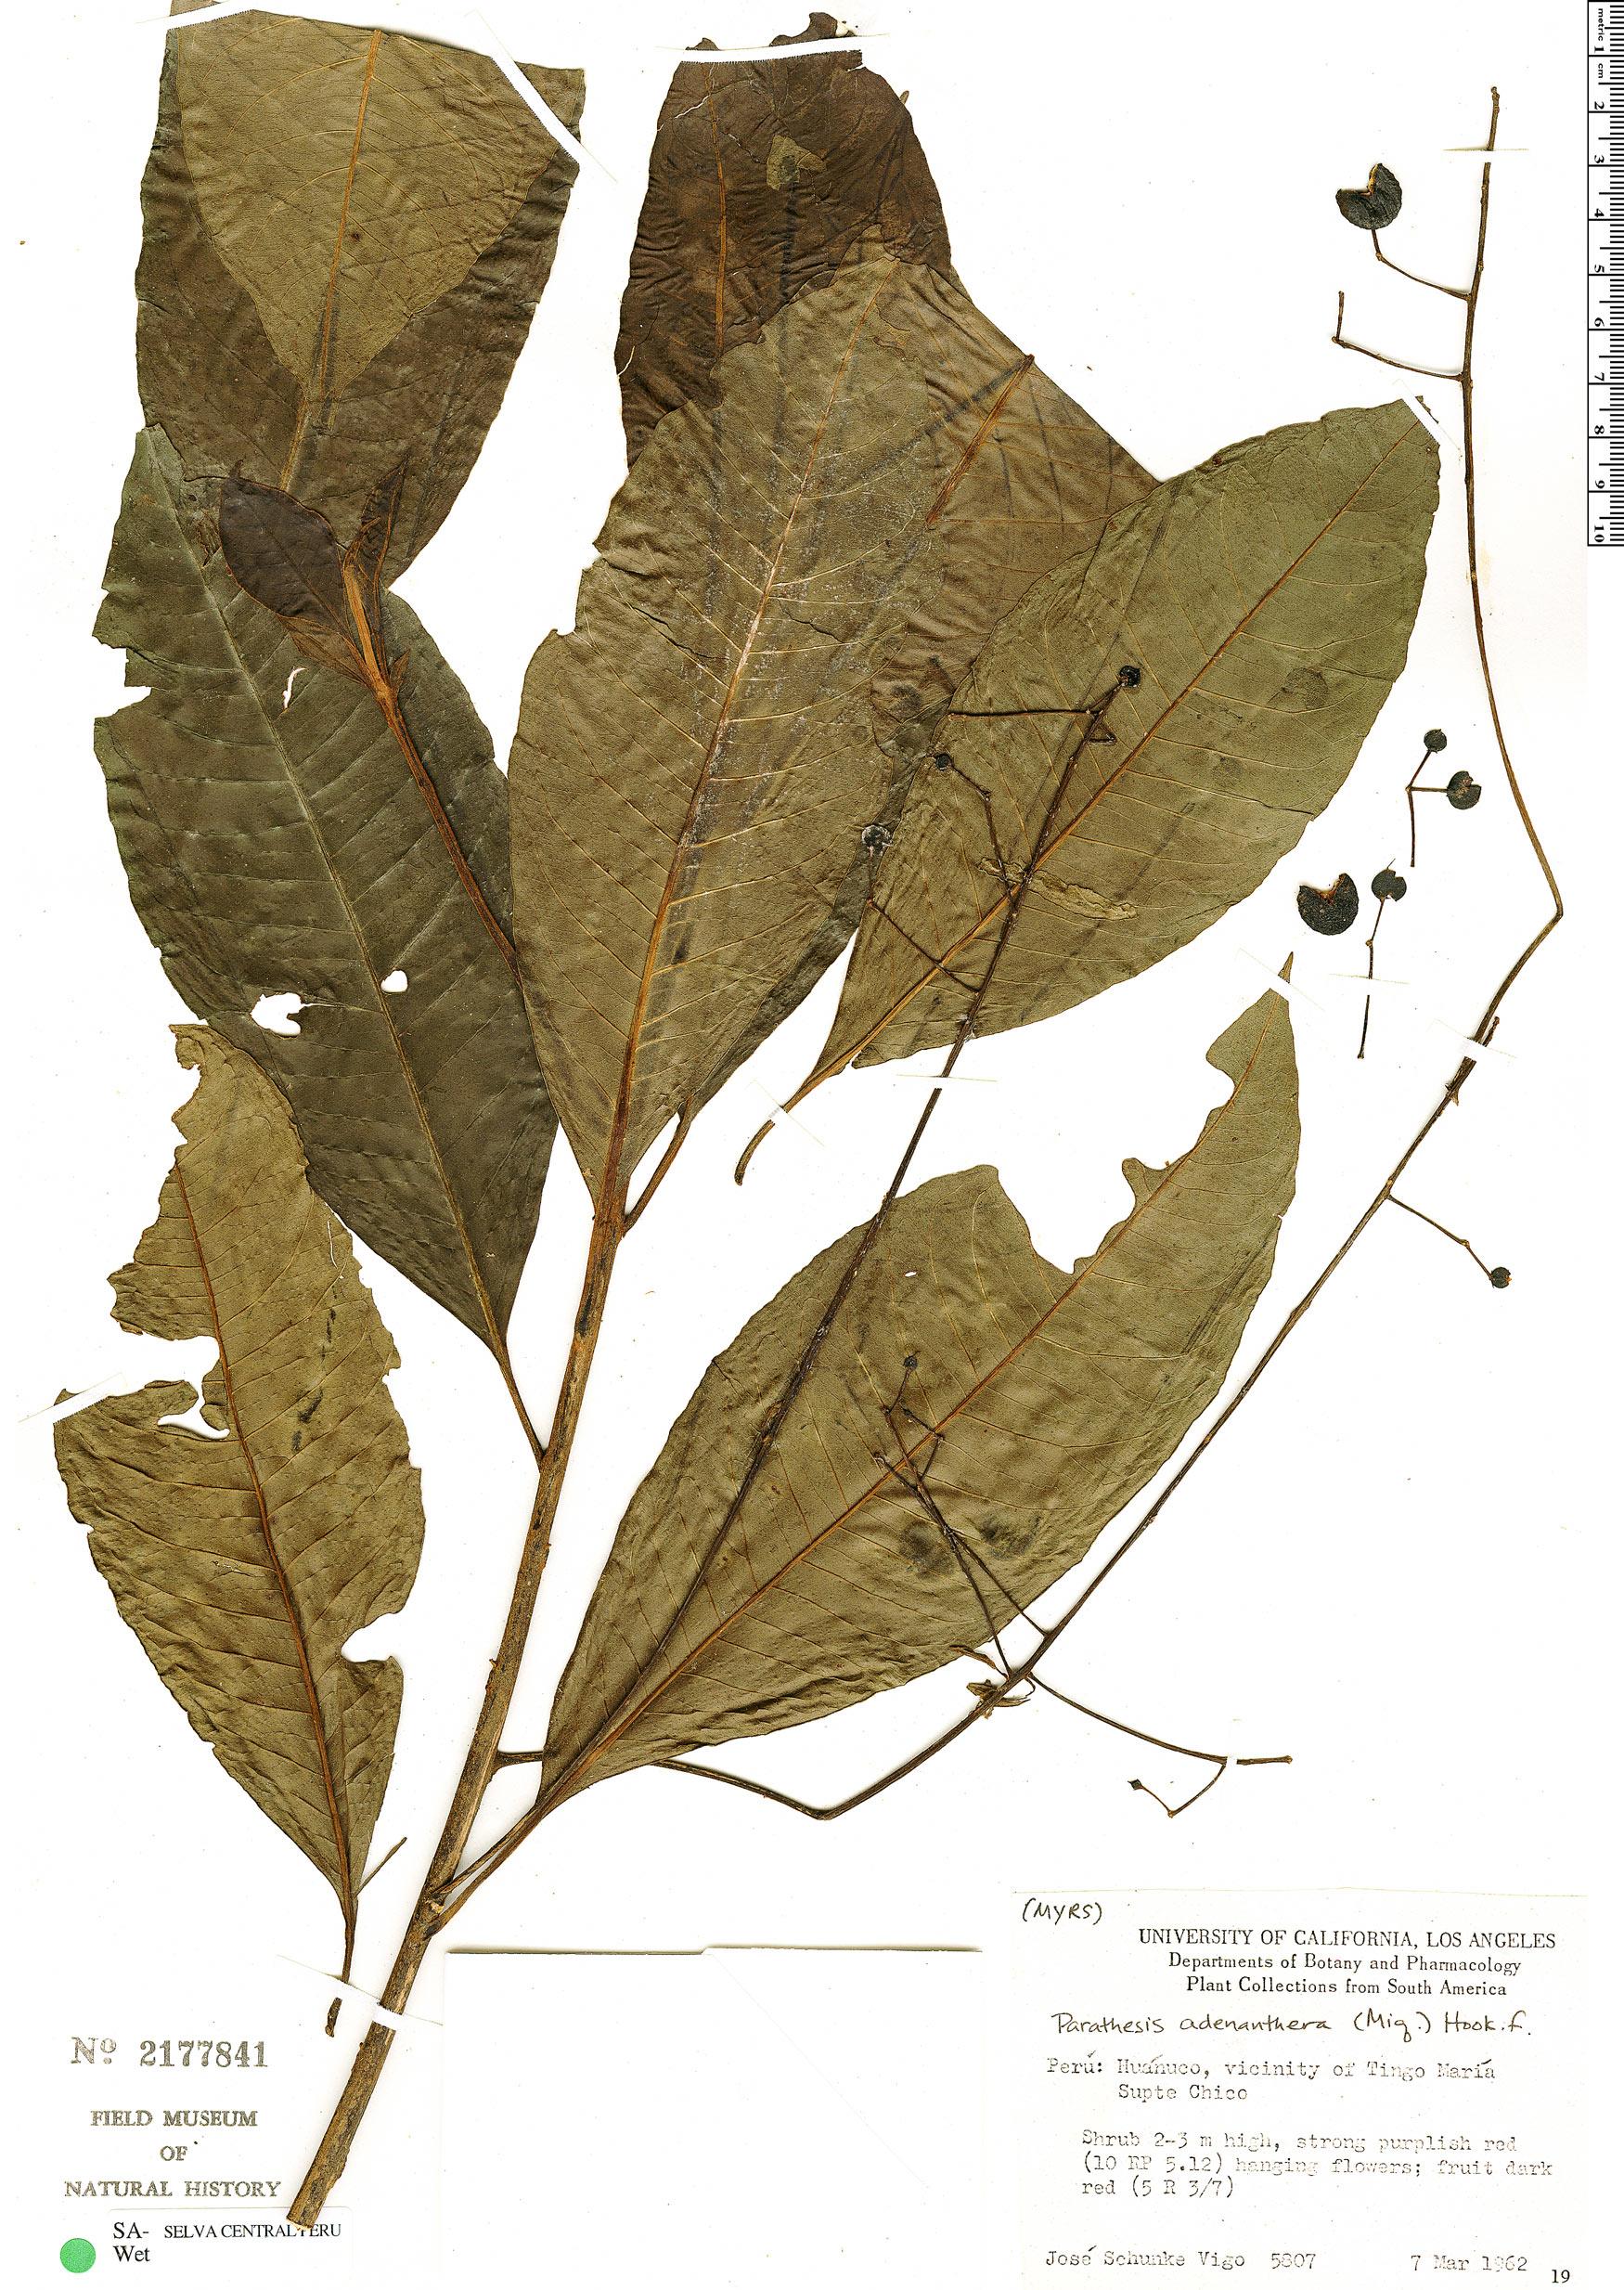 Specimen: Parathesis adenanthera